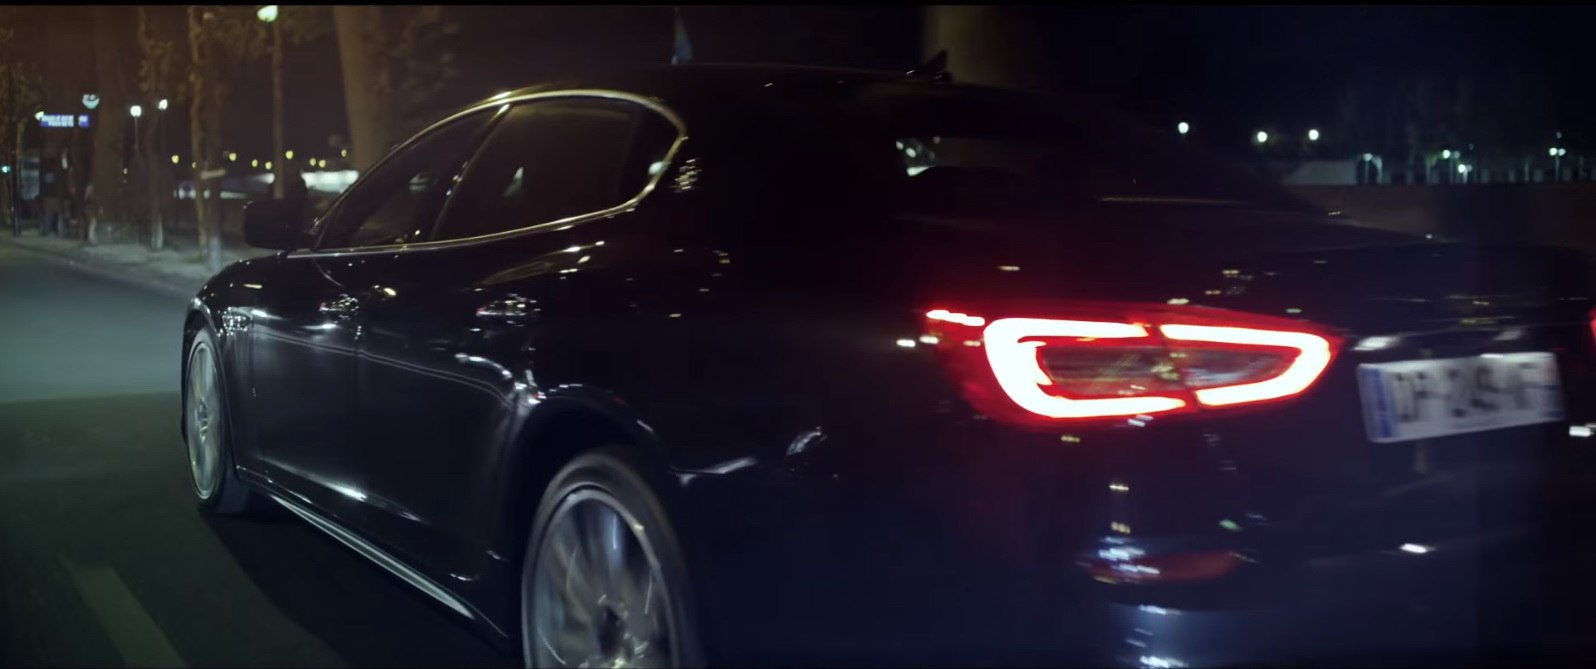 Maserati Quattroporte - Mylène Farmer & Sting - Stolen Car (7)